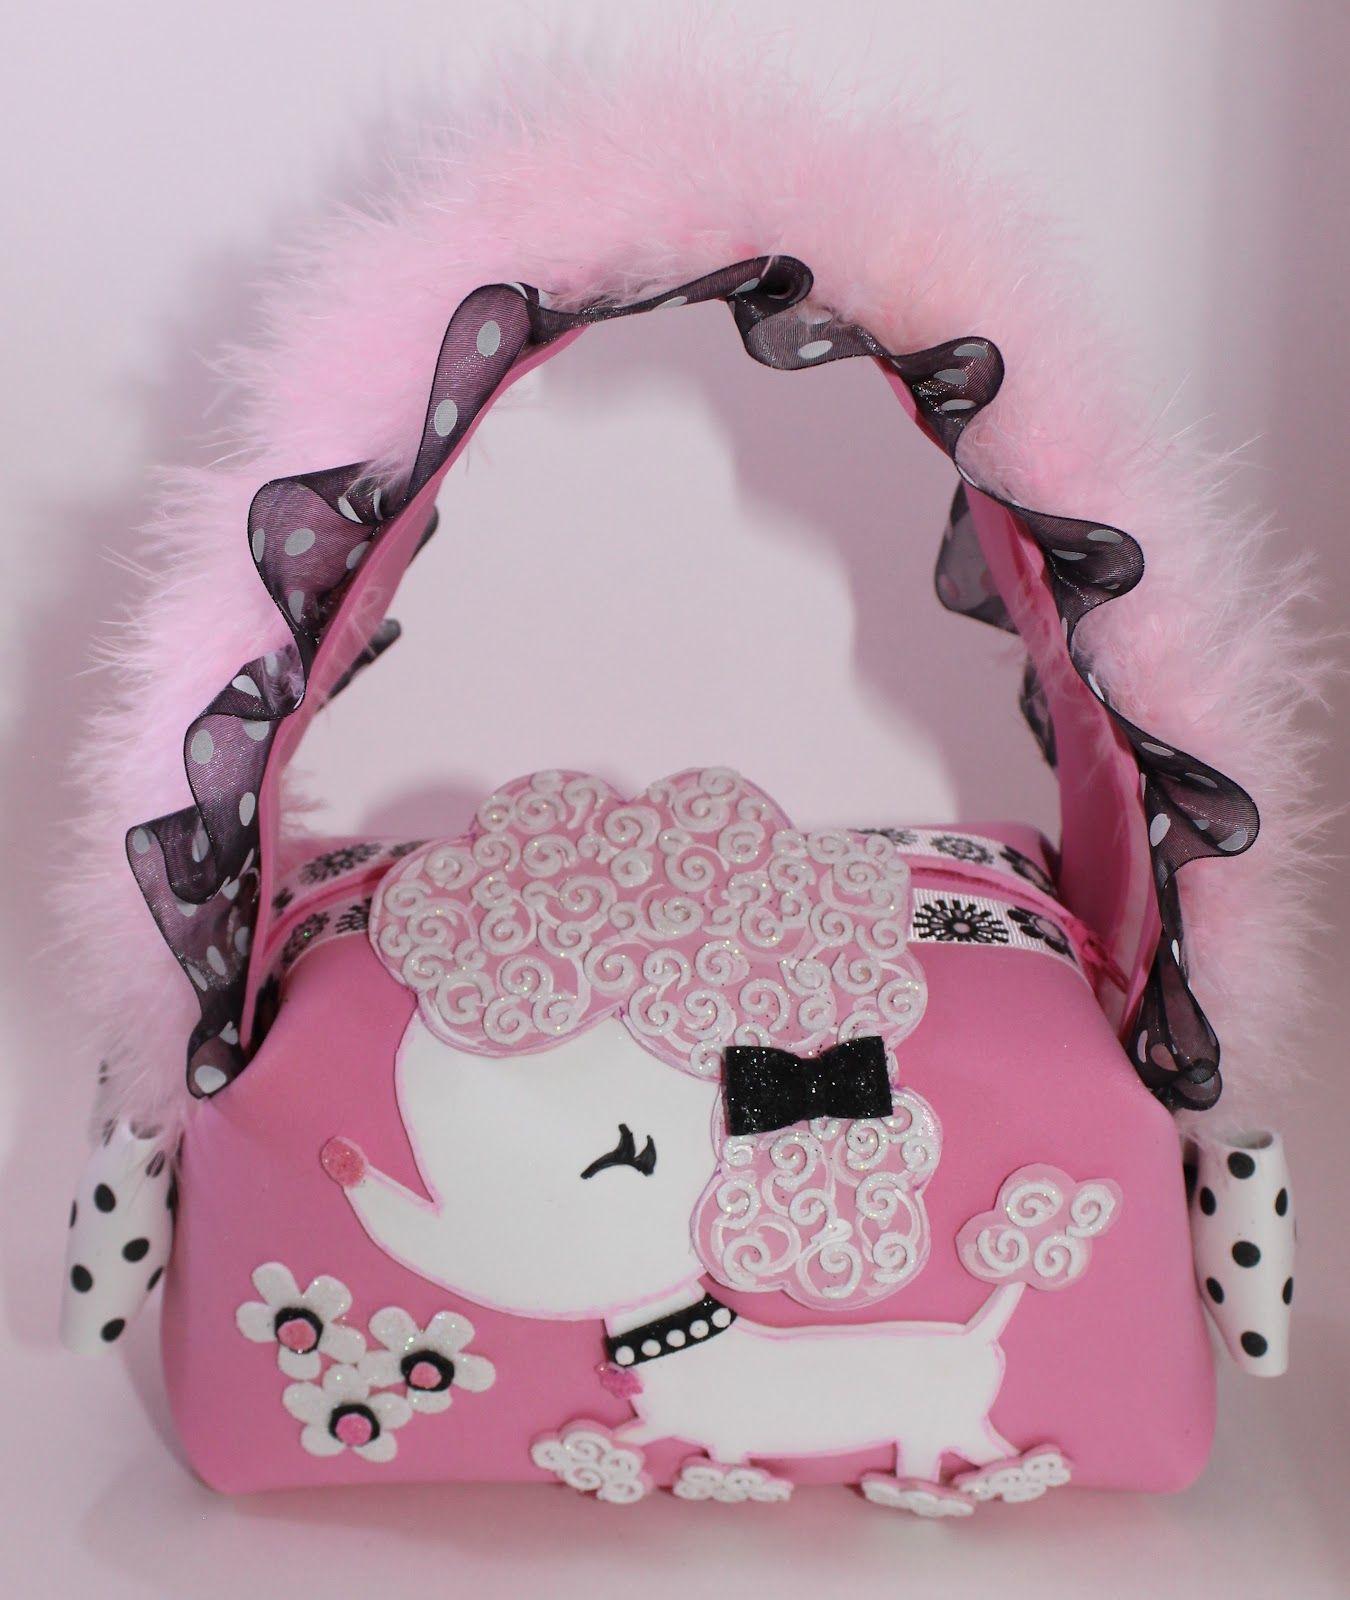 a8c82e020 bolsa de foami para niñas | Ideas creativas✨ | Kids purse, Foam ...